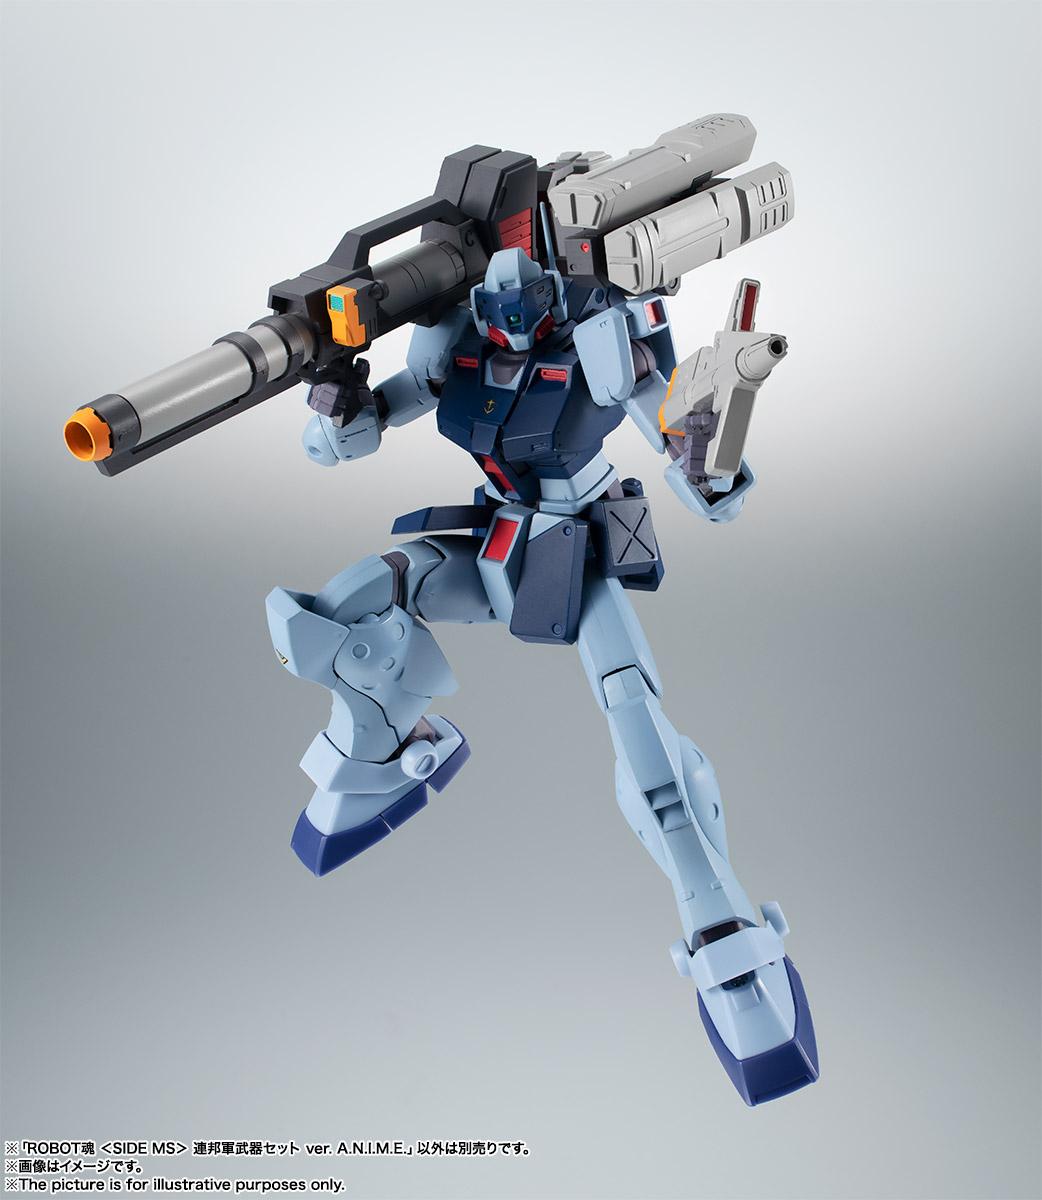 ROBOT魂〈SIDE MS〉『連邦軍武器セット ver. A.N.I.M.E.』ガンダム 完成品フィギュア-018